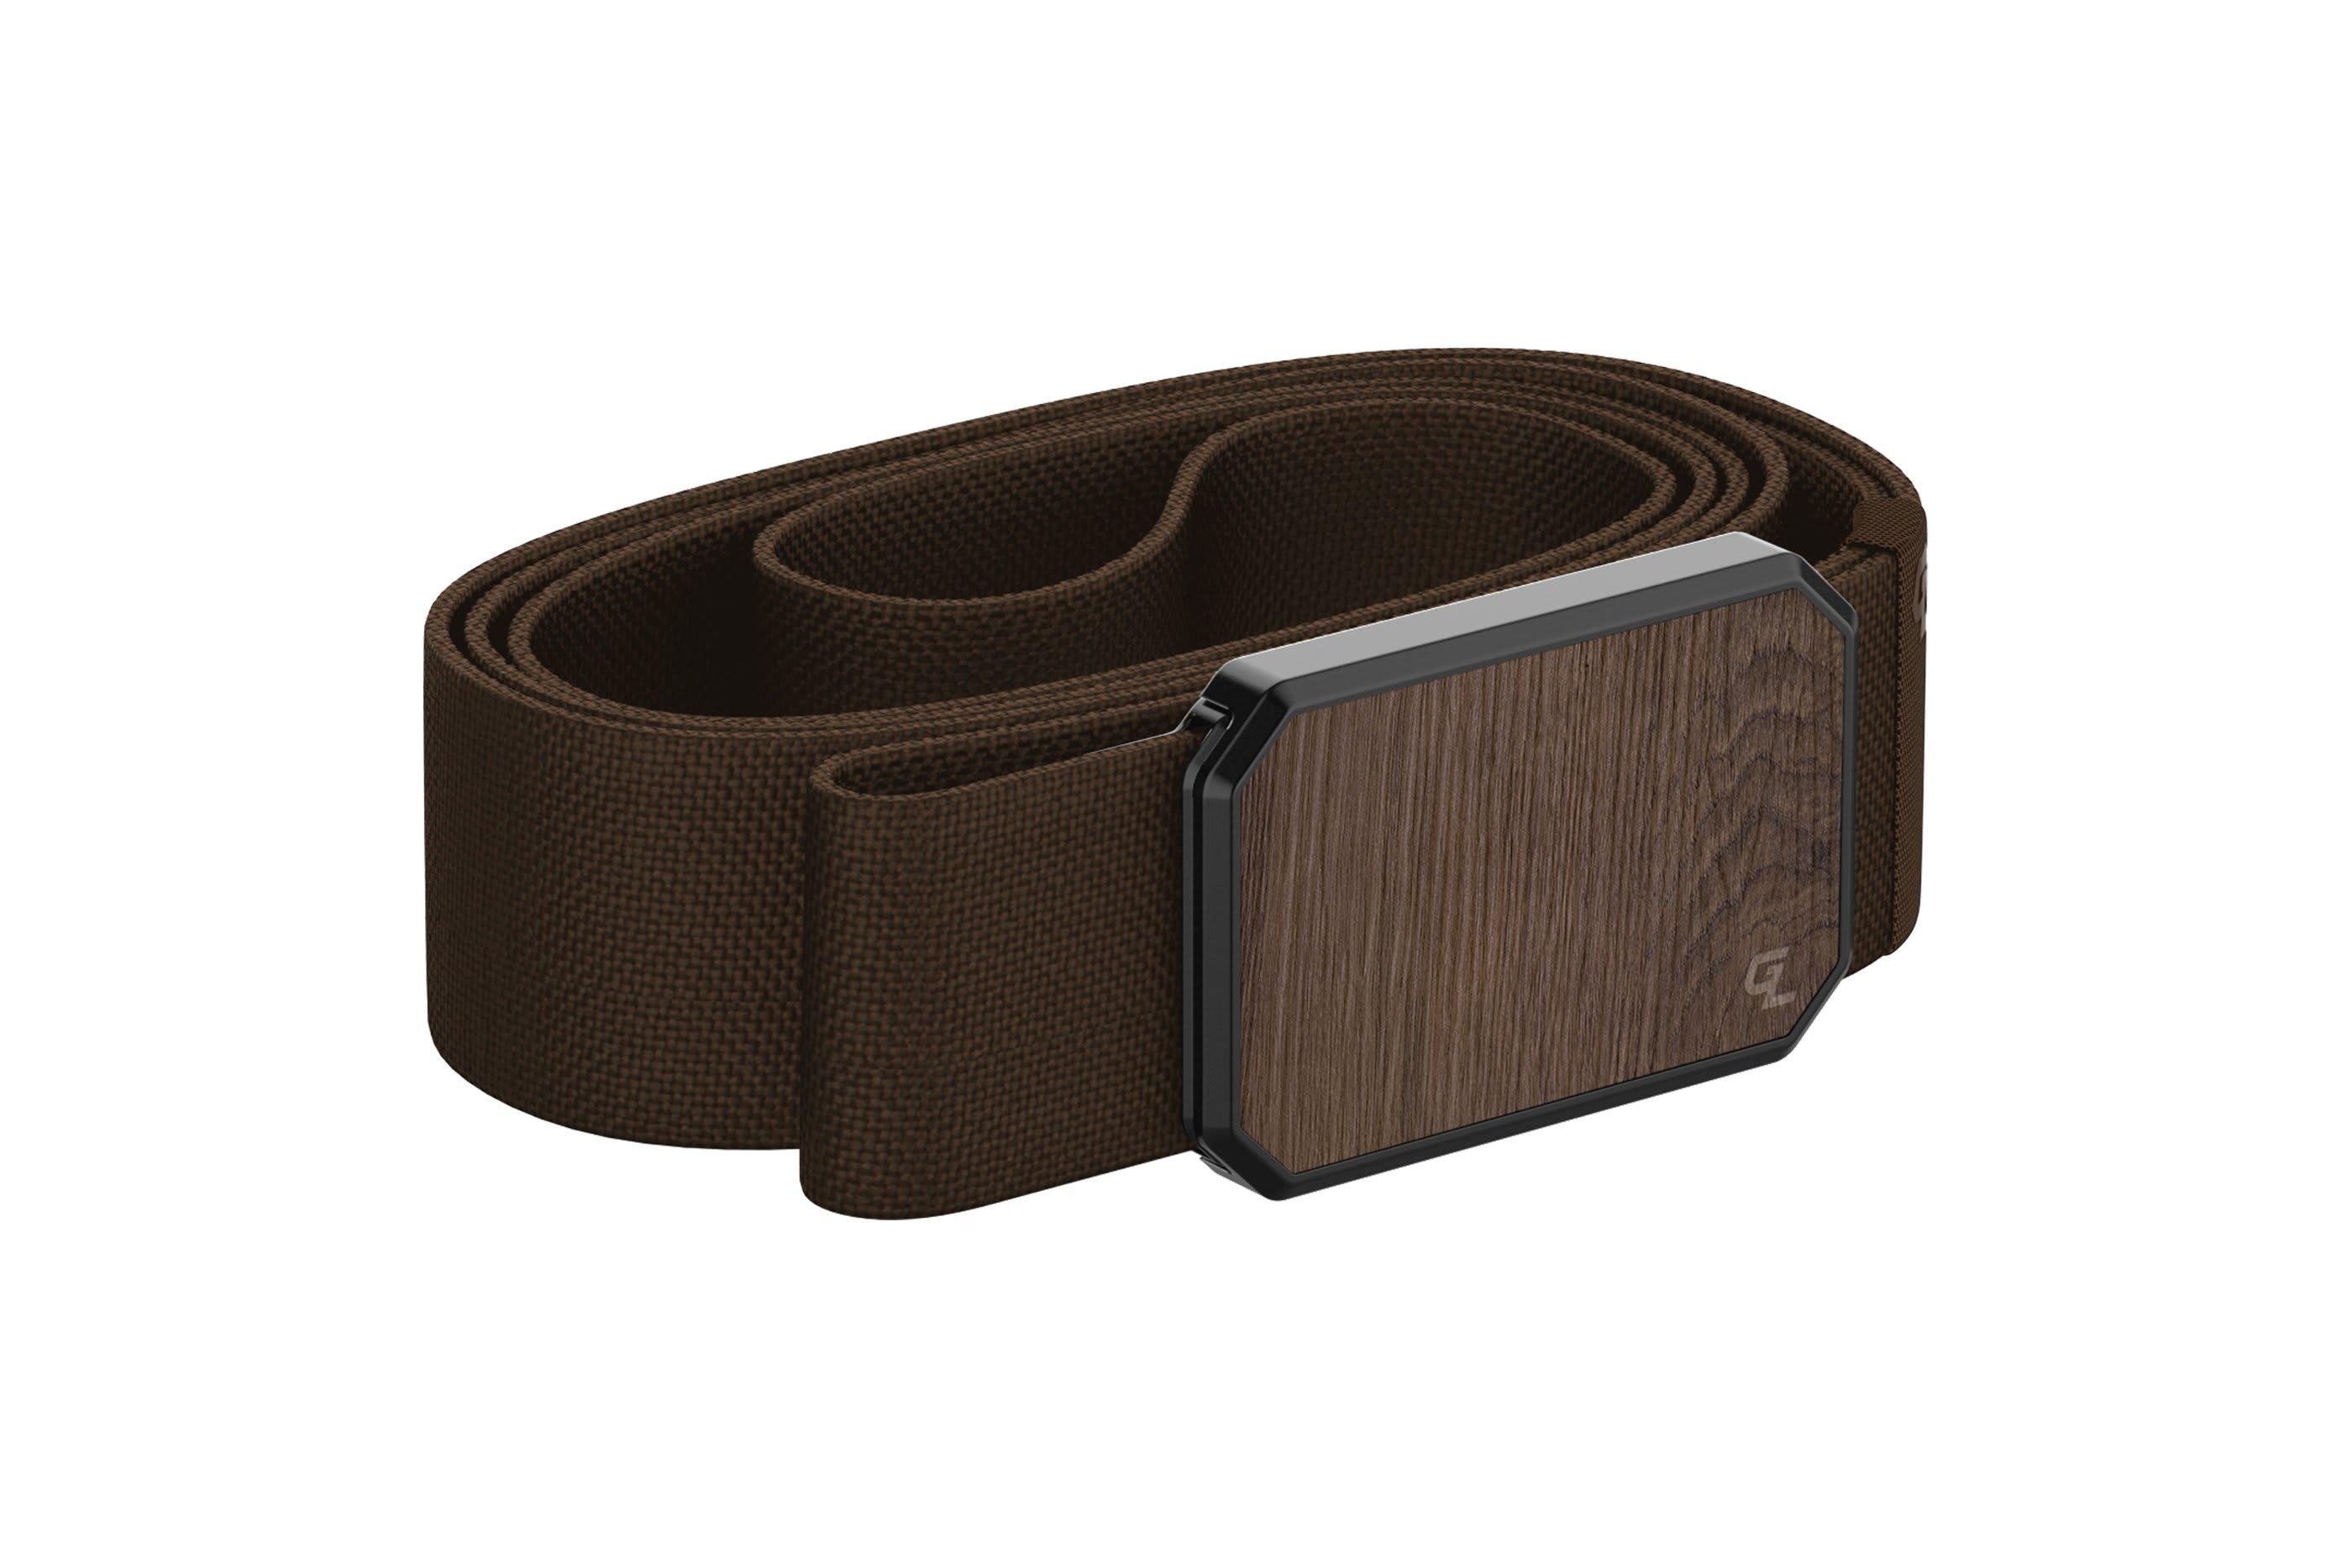 Groove Belt Walnut/Brown  viewed from side